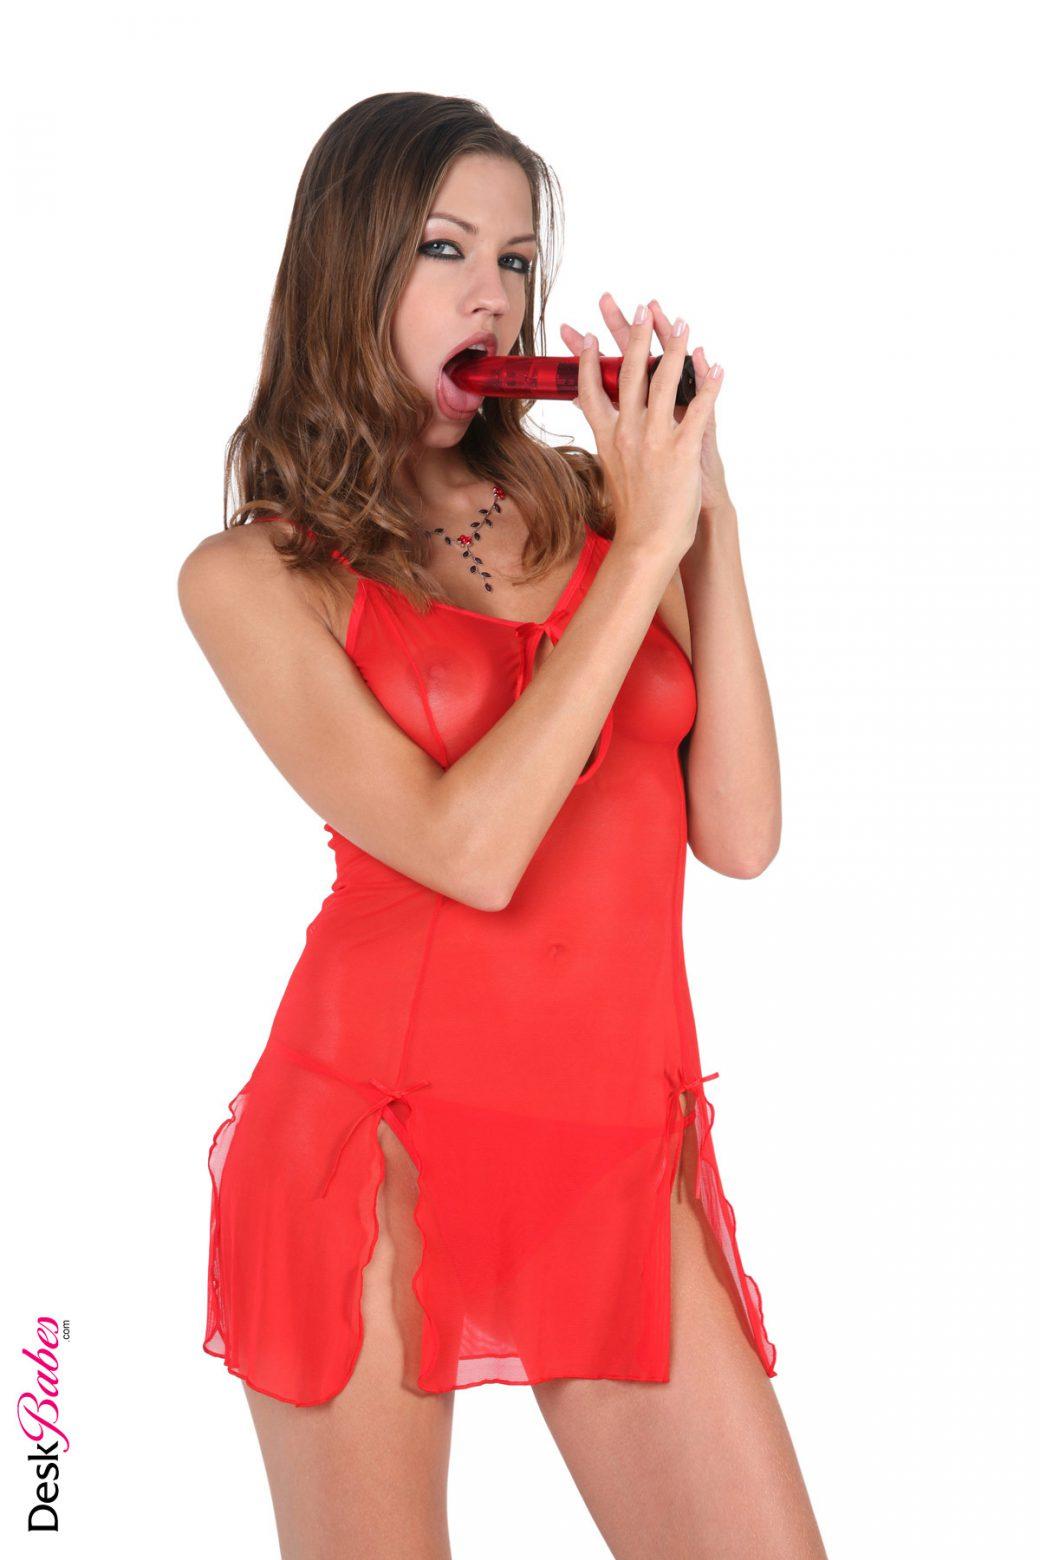 Eufrat Solo - Virtual sexy dance of pornstar girls on a